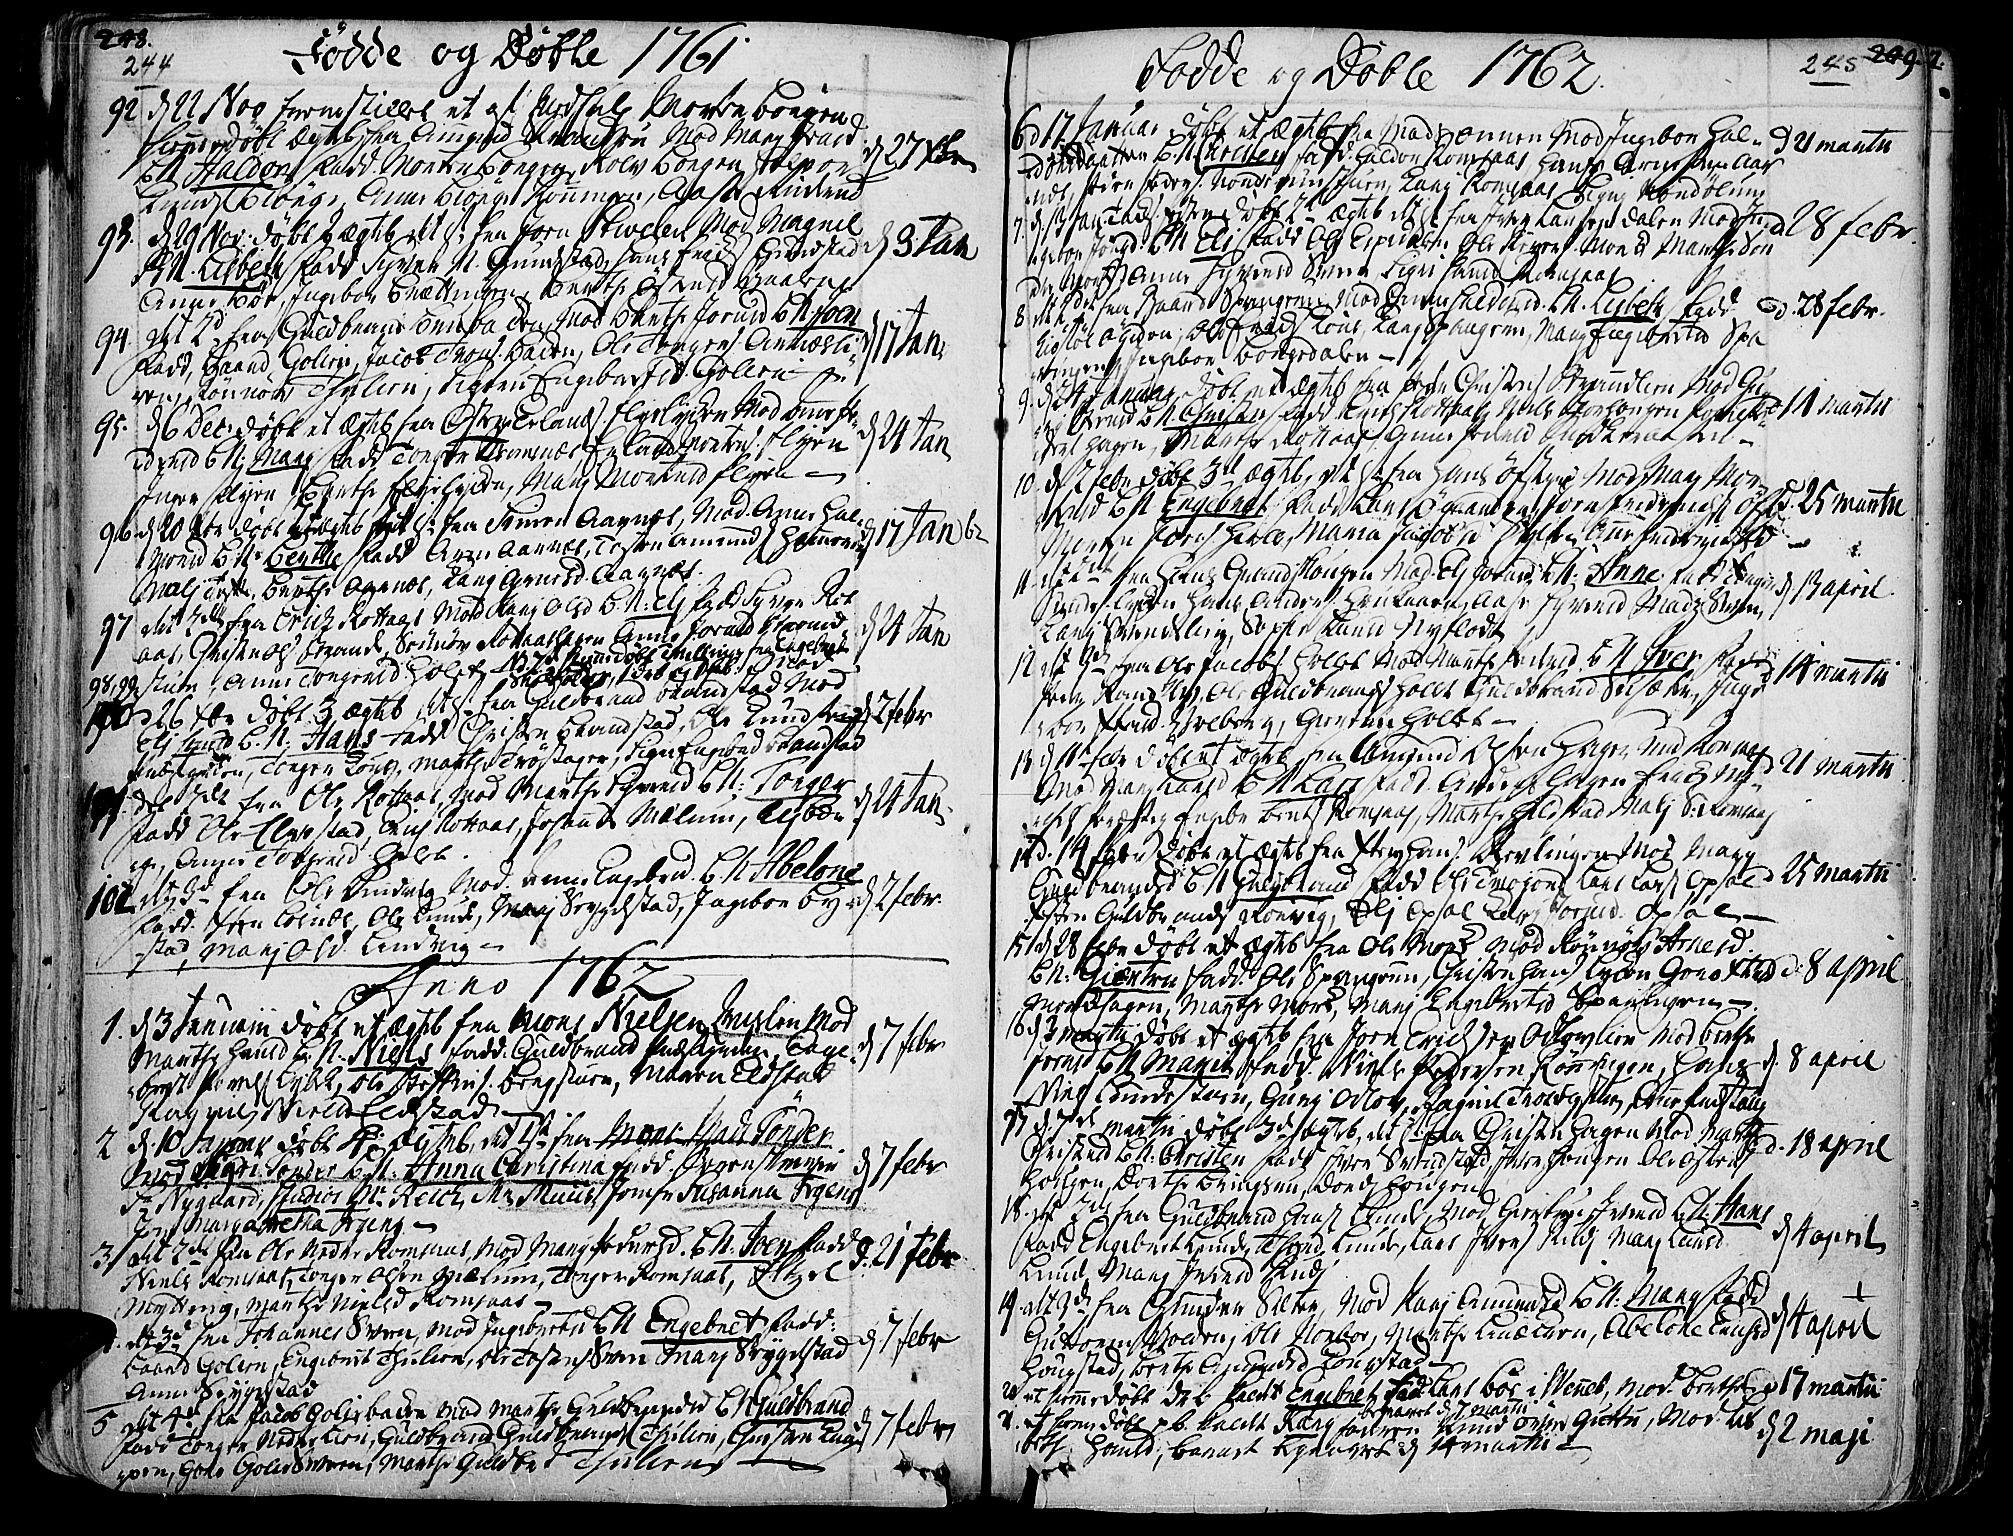 SAH, Ringebu prestekontor, Ministerialbok nr. 2, 1734-1780, s. 244-245